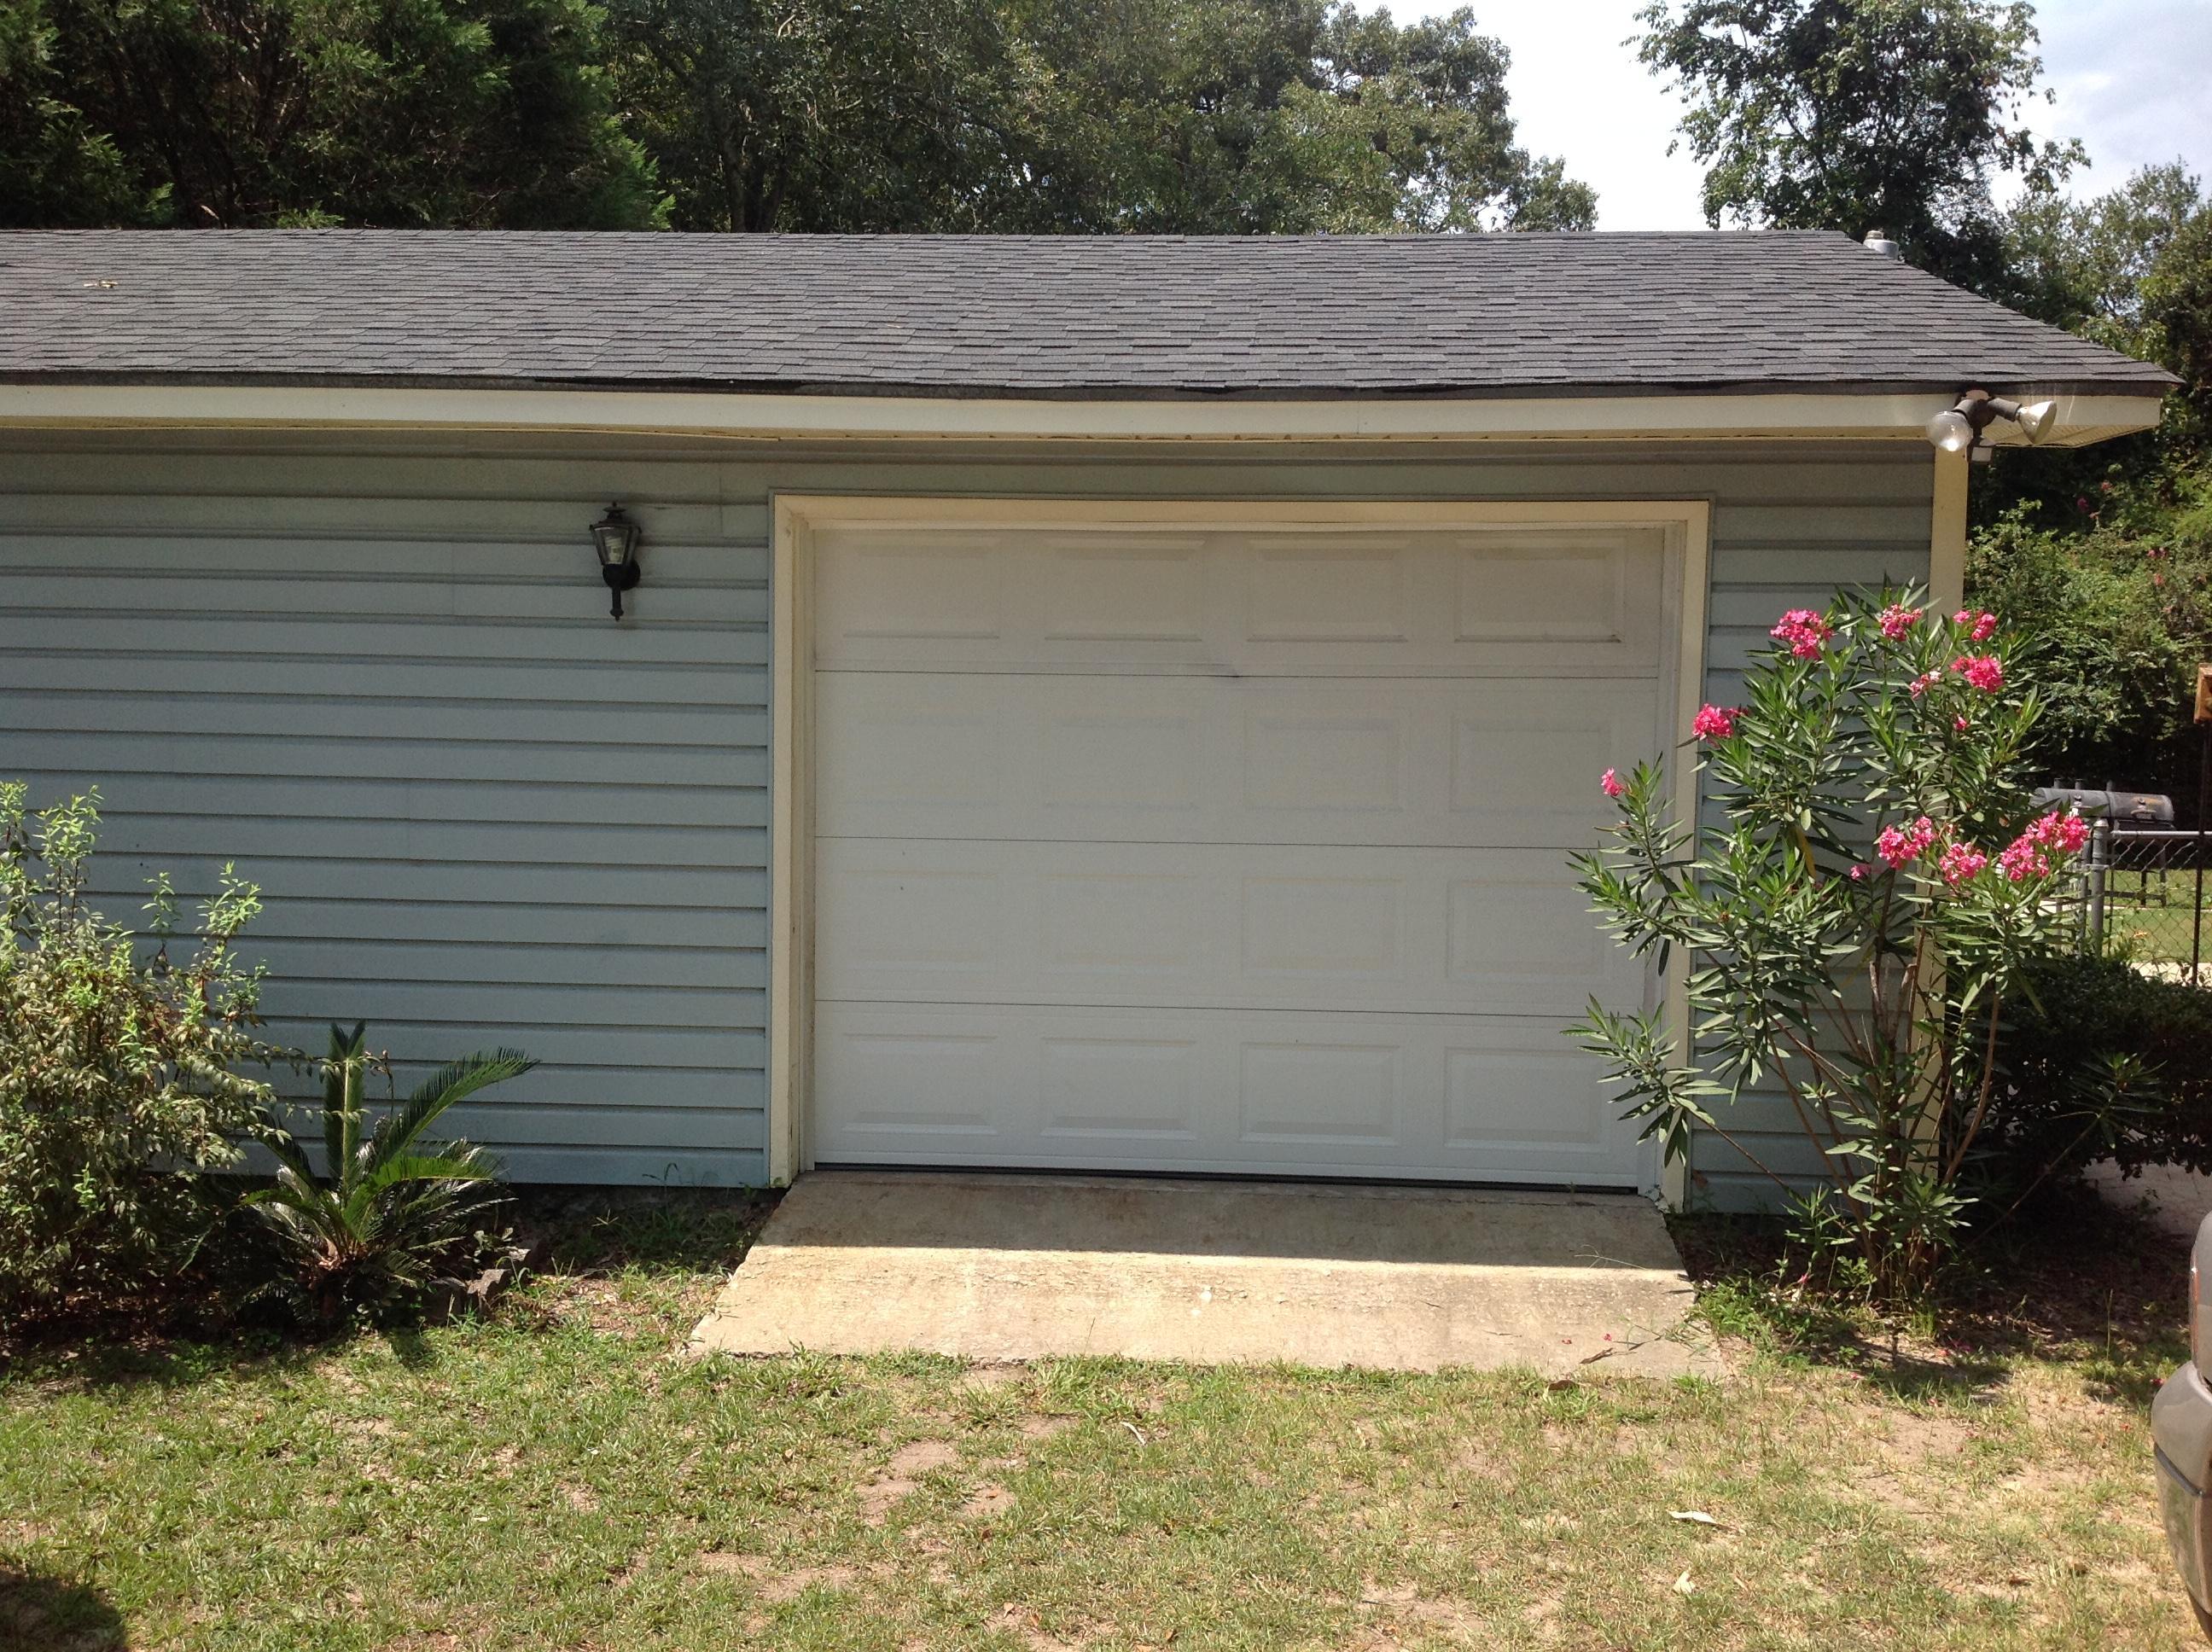 Belvedere II Homes For Sale - 122 Dogwood, Eutawville, SC - 35